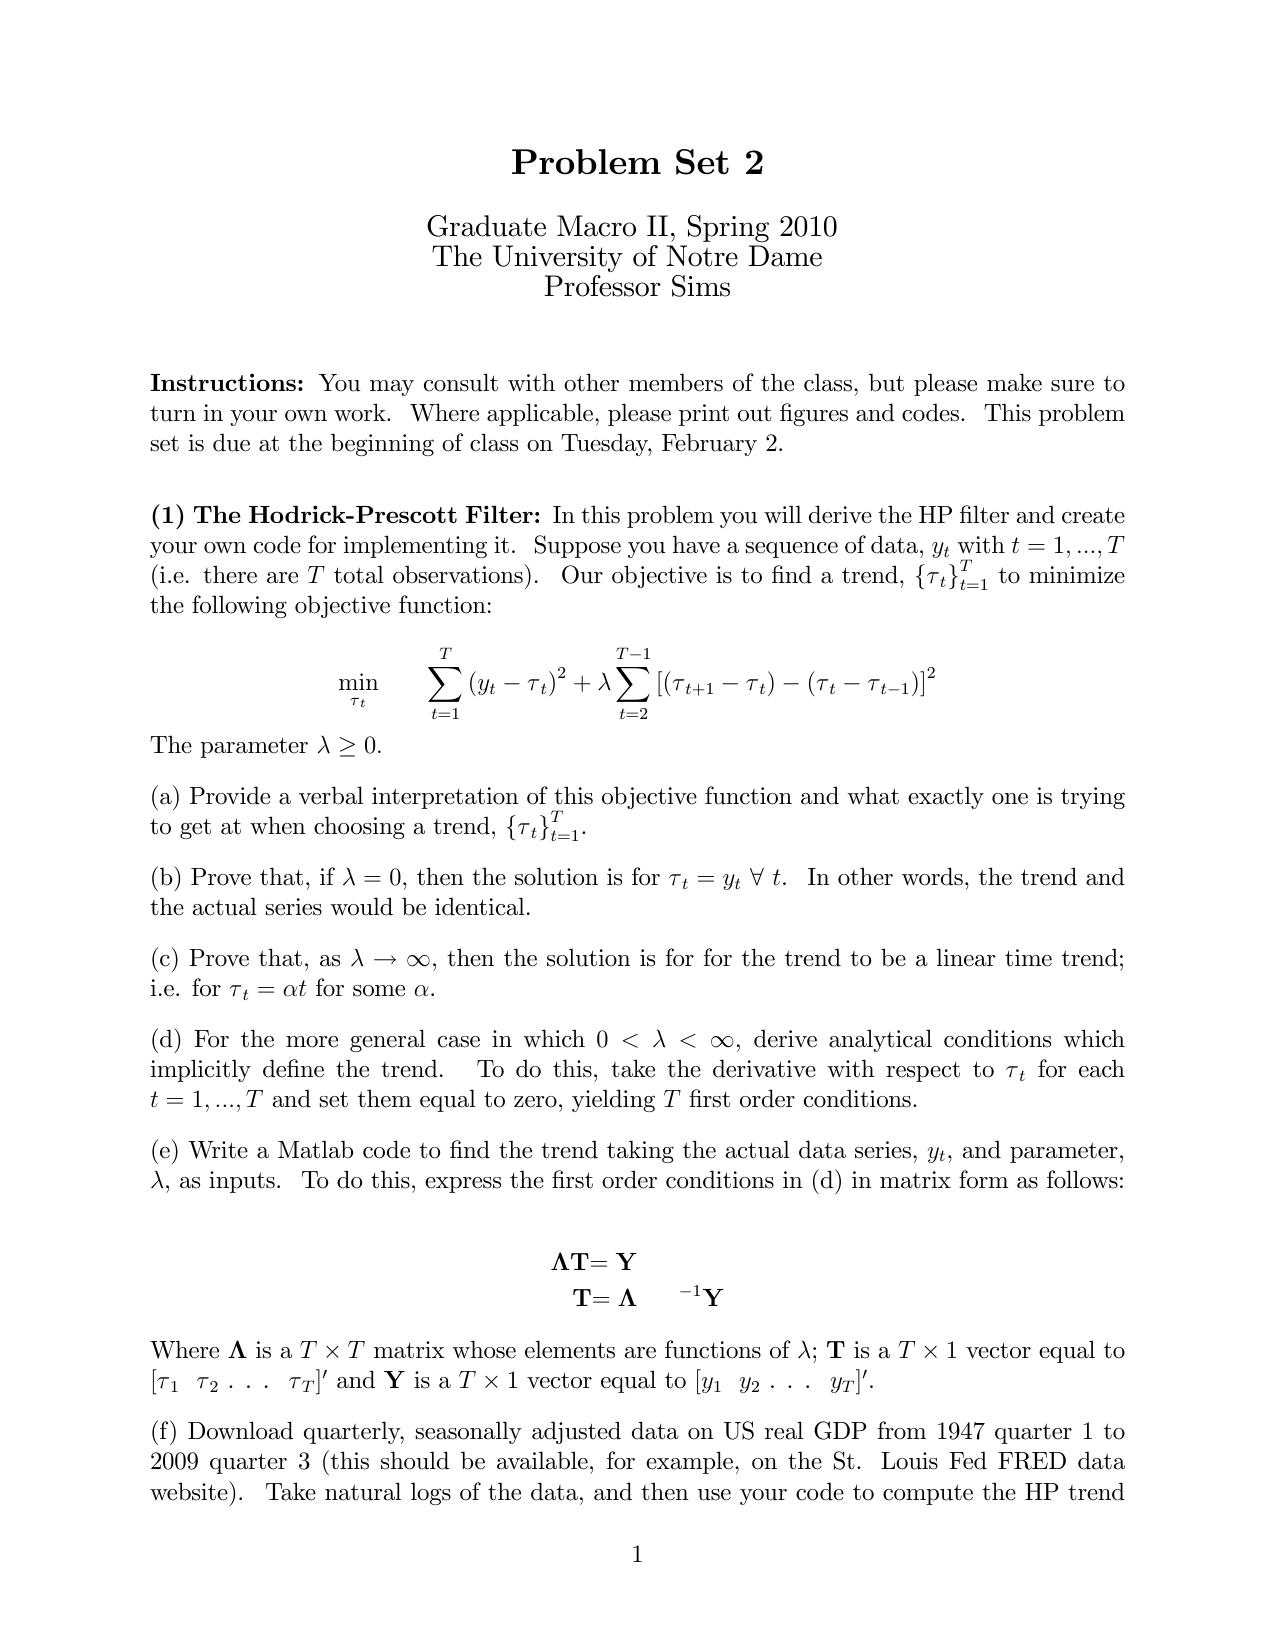 Problem Set 2 - University of Notre Dame